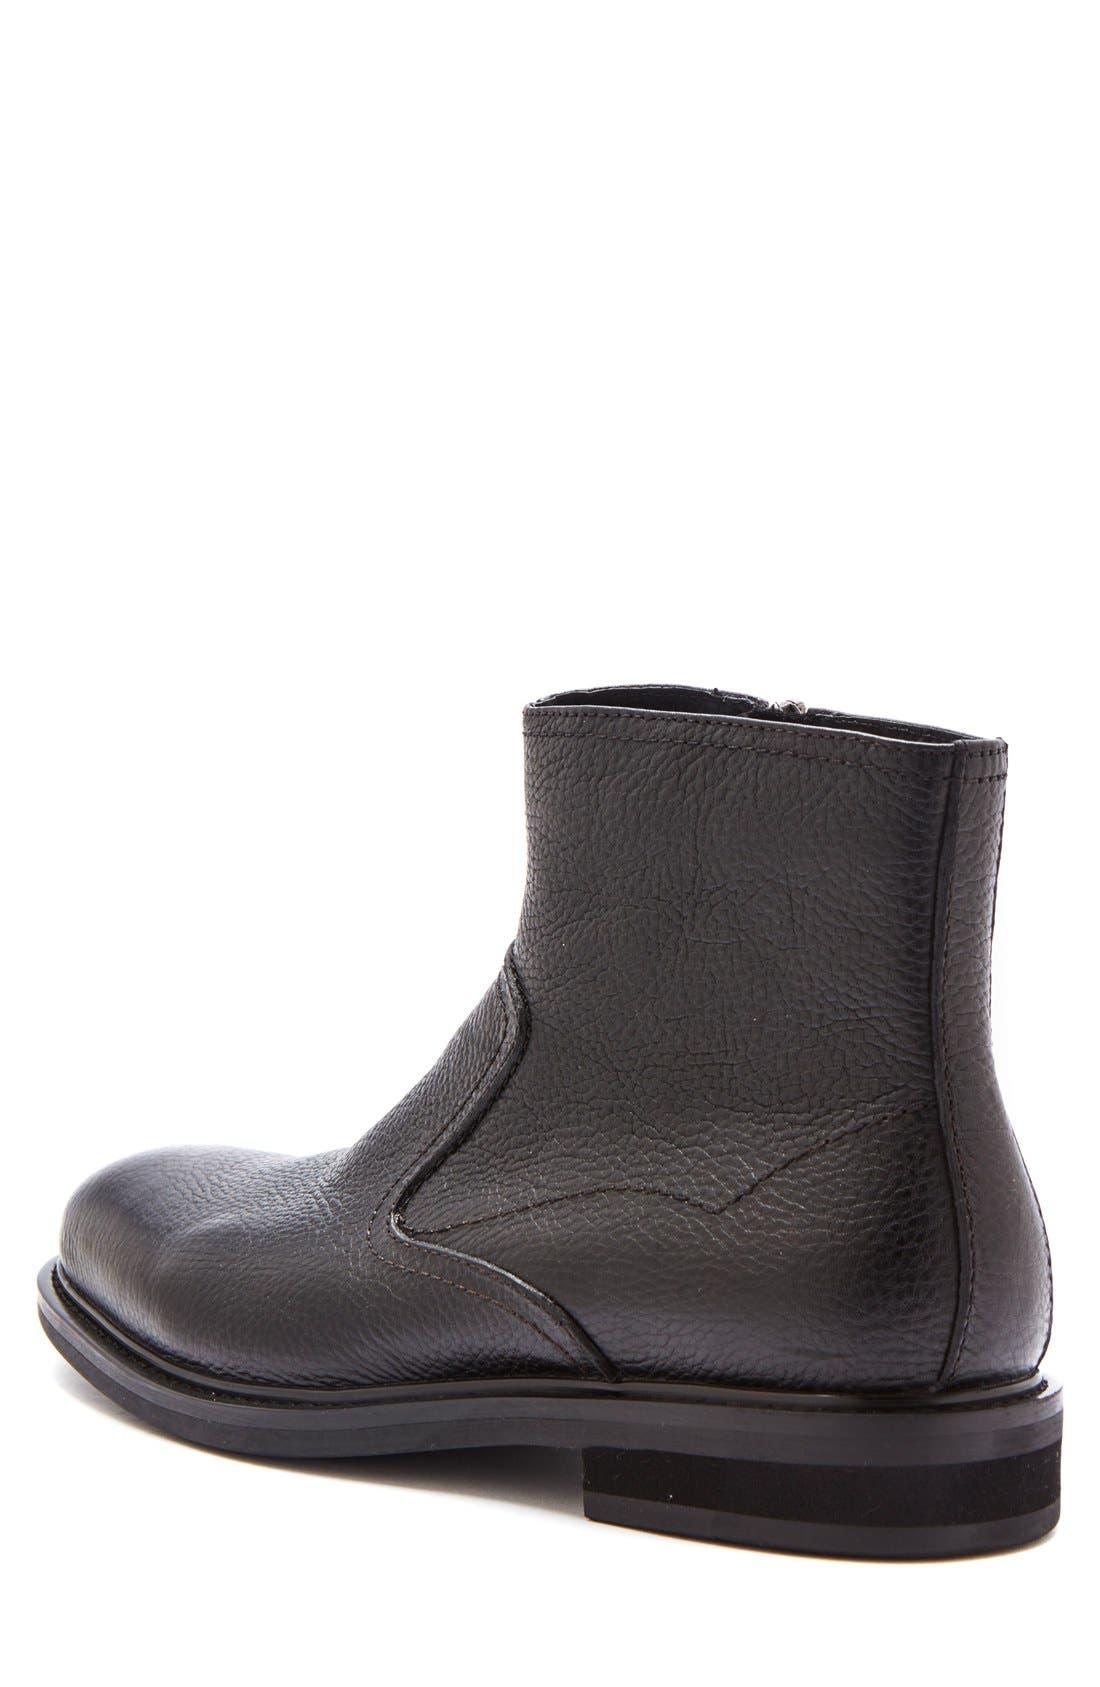 'Fried' Waterproof Zip Boot,                             Alternate thumbnail 2, color,                             001